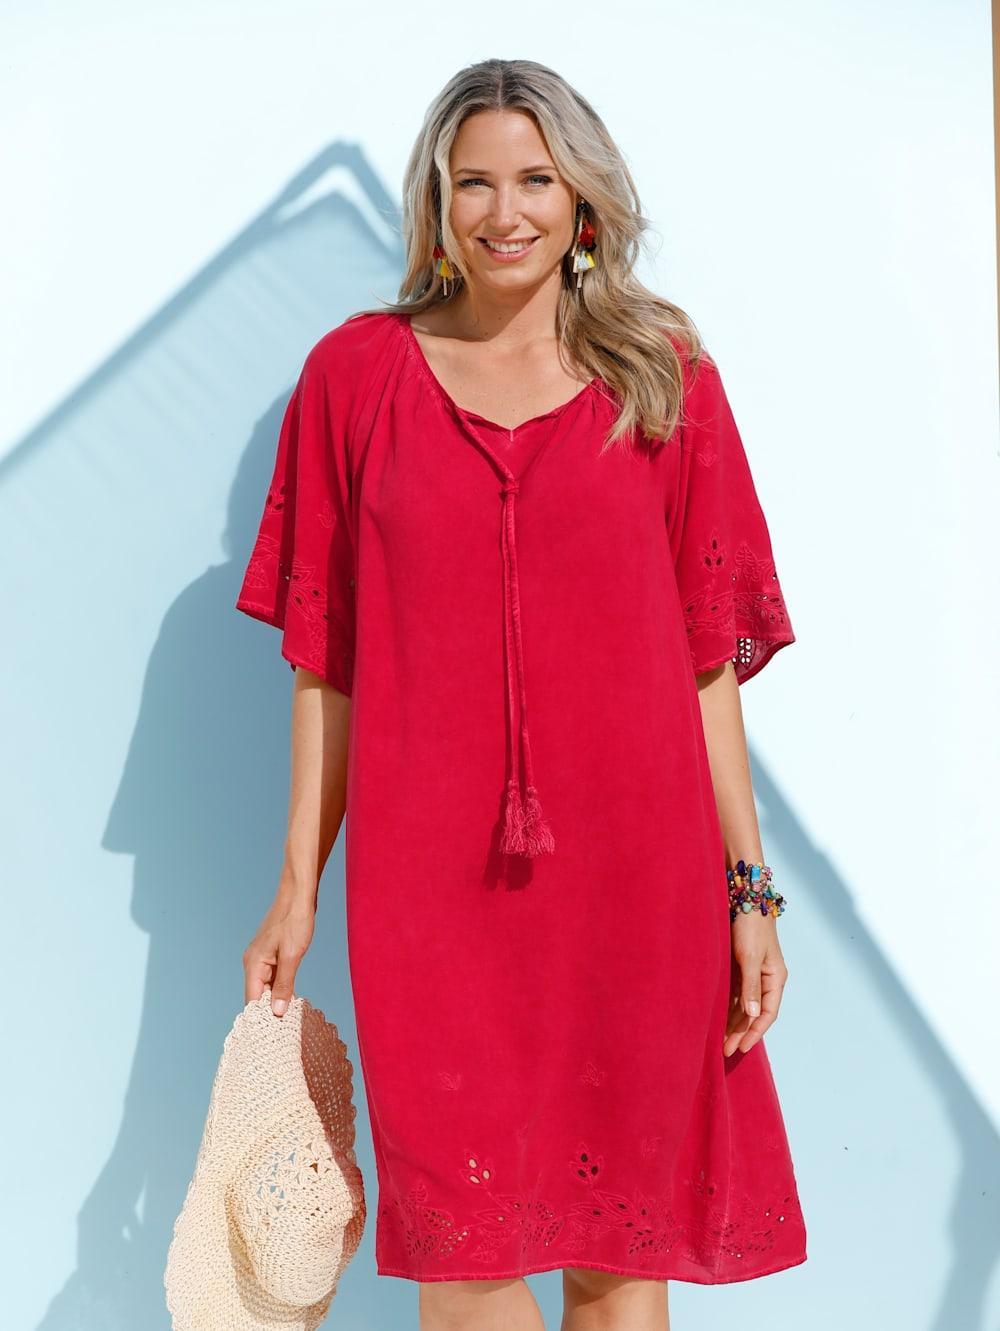 MIAMODA Kleid in angesagtem Oil-Washed-Effekt  Mia Moda